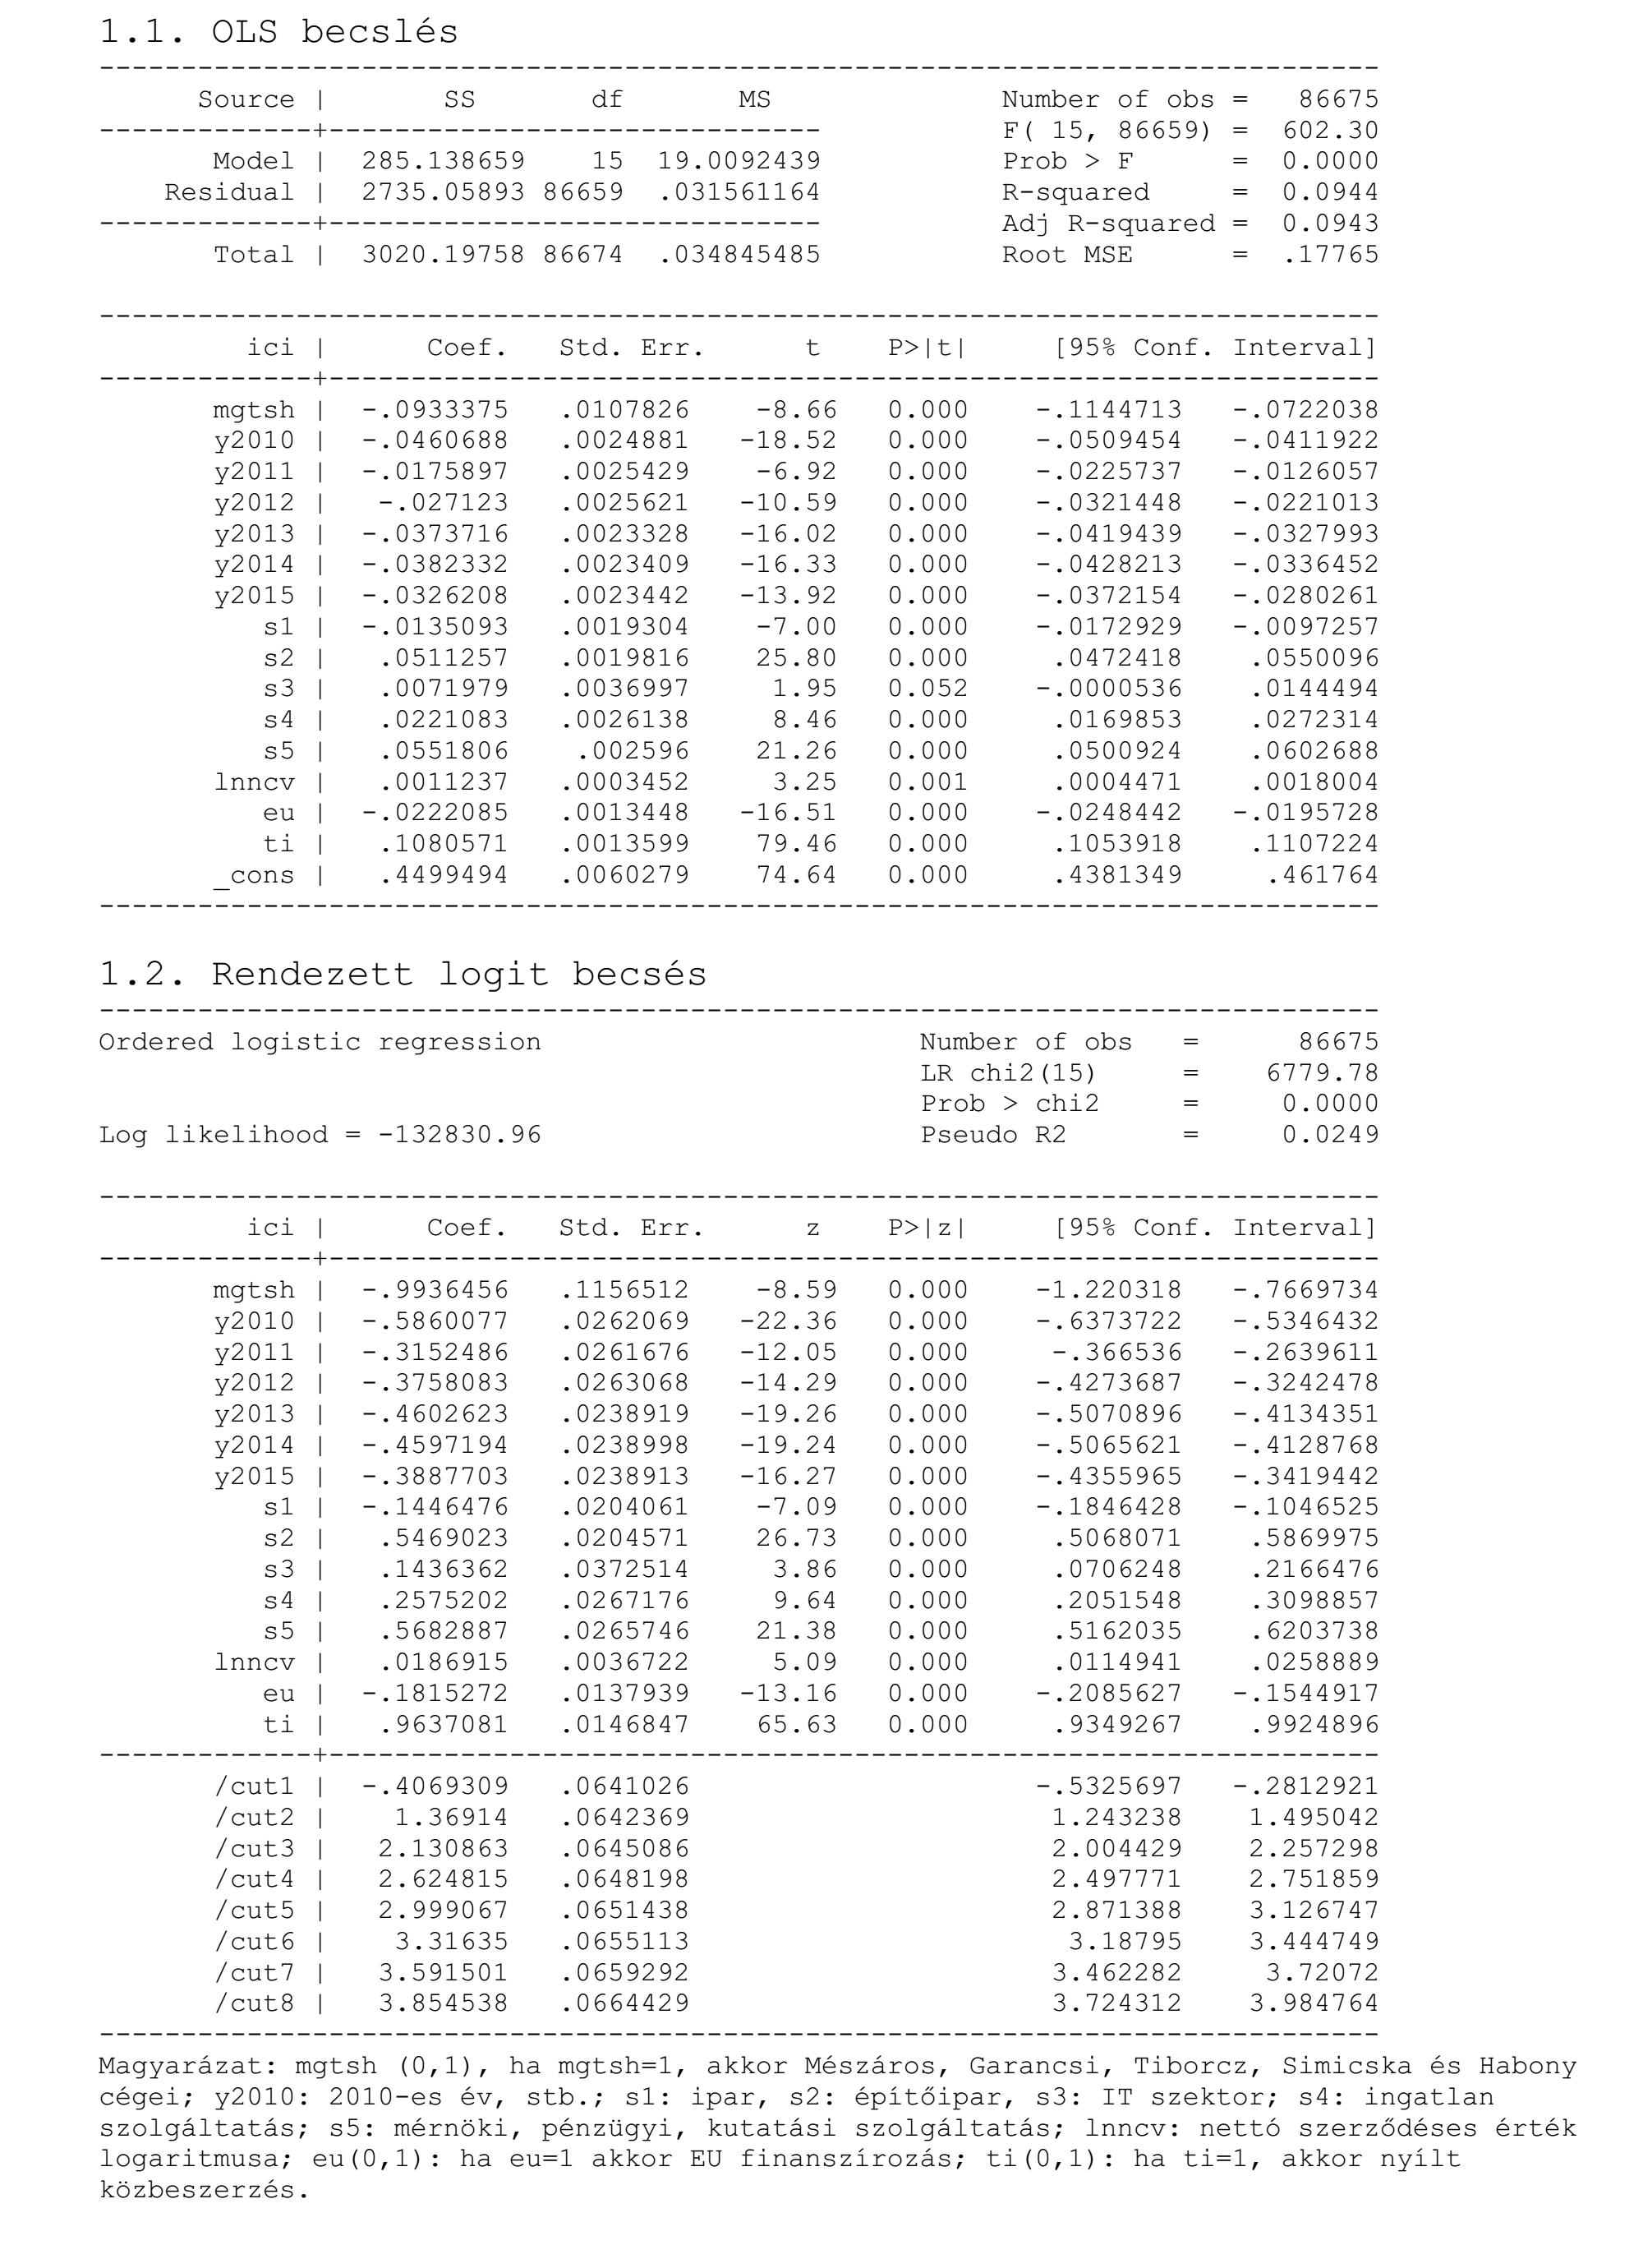 estimations1_1